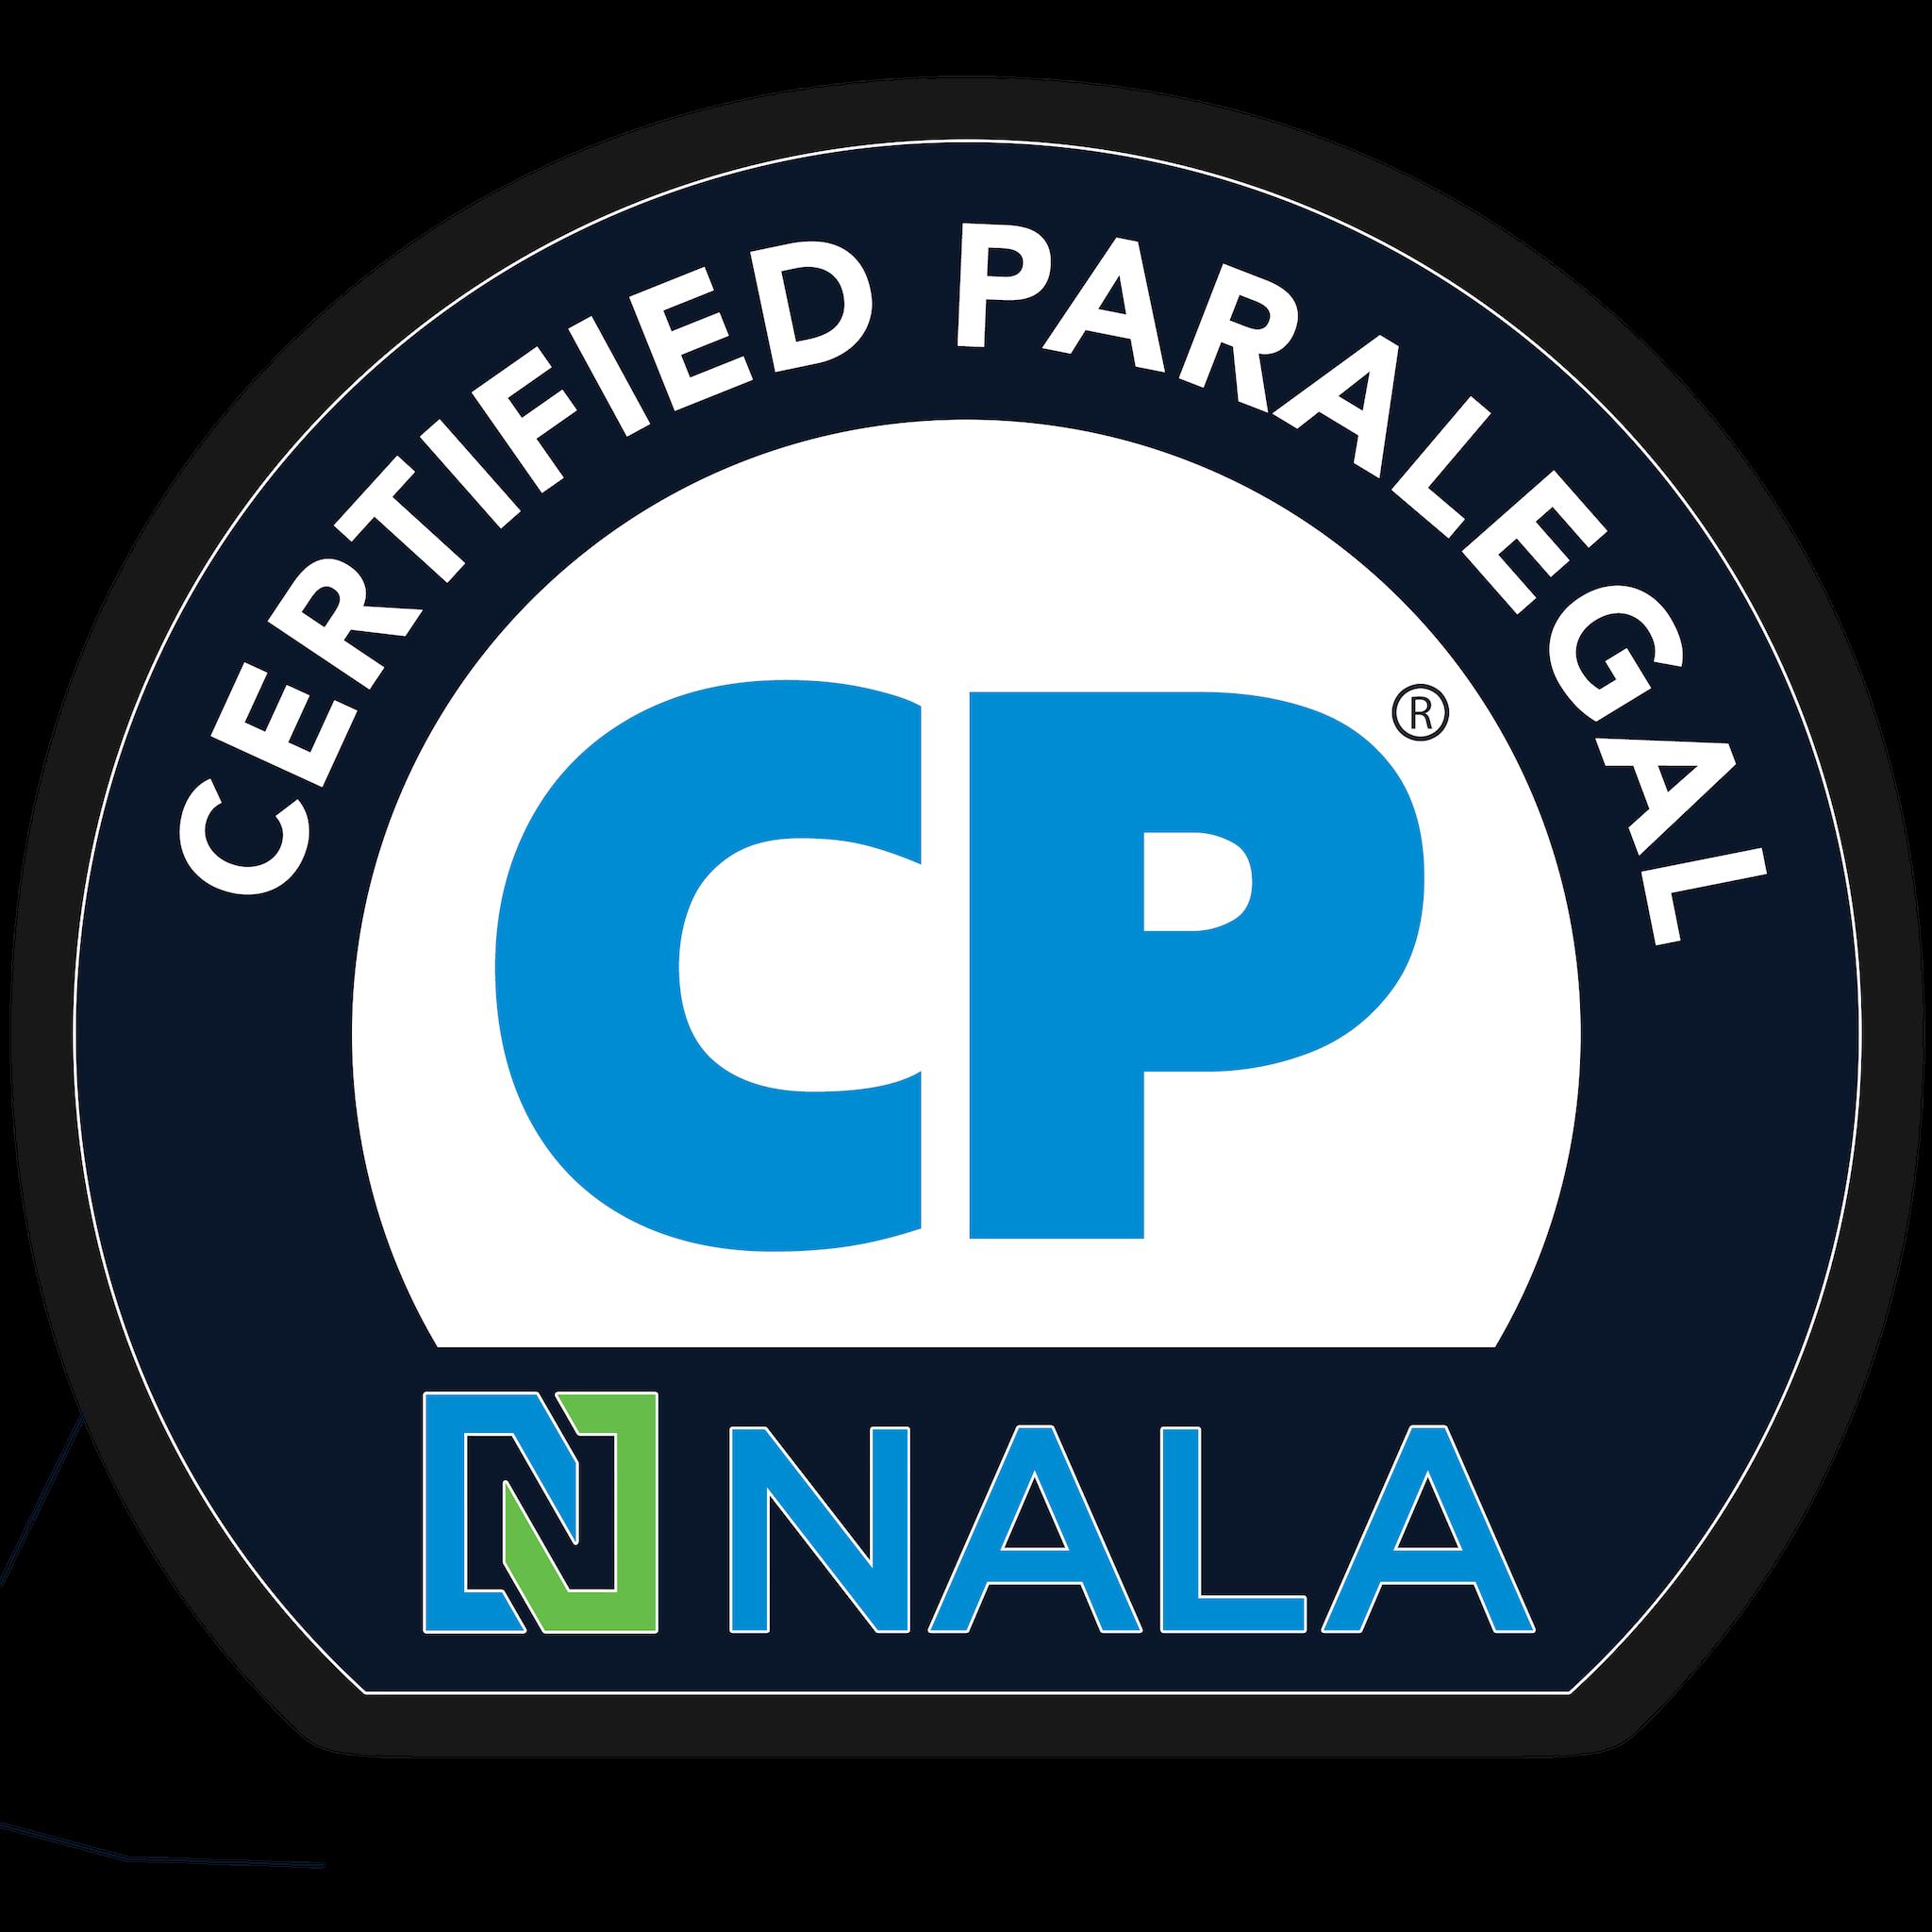 NALA Certified Paralegal